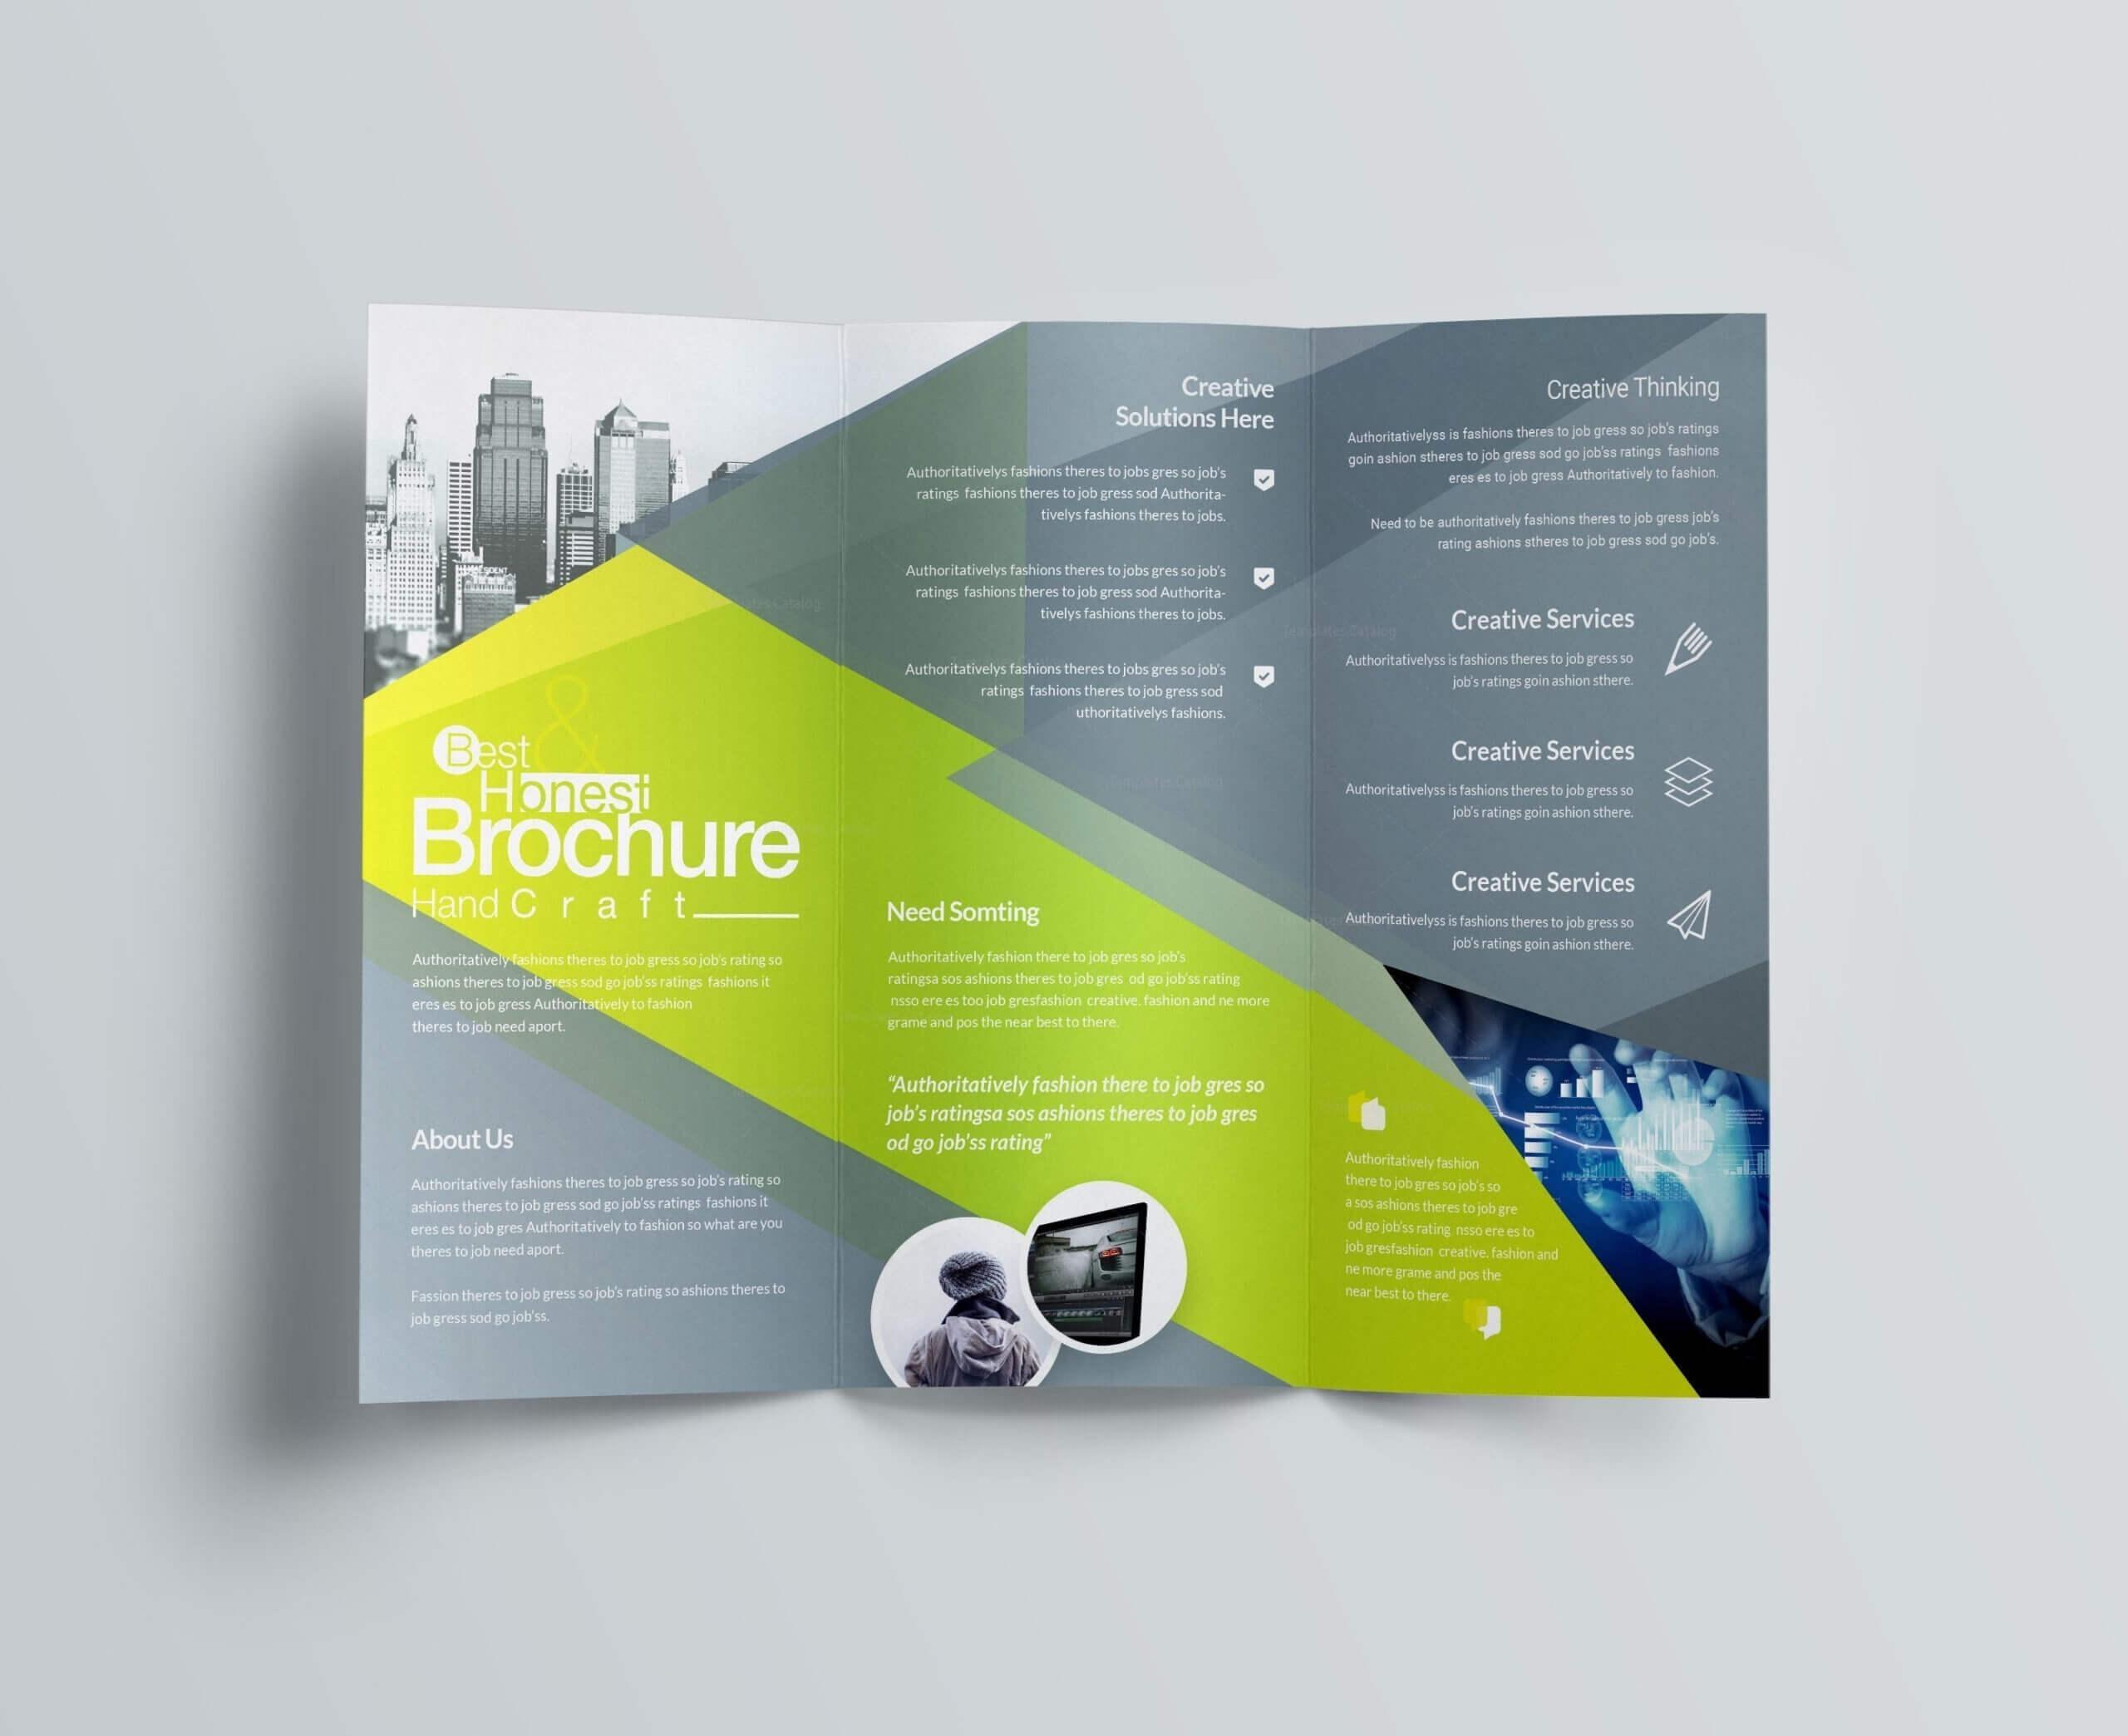 013 Free Brochure Templates For Mac Apartment Flyers Inside Mac Brochure Templates